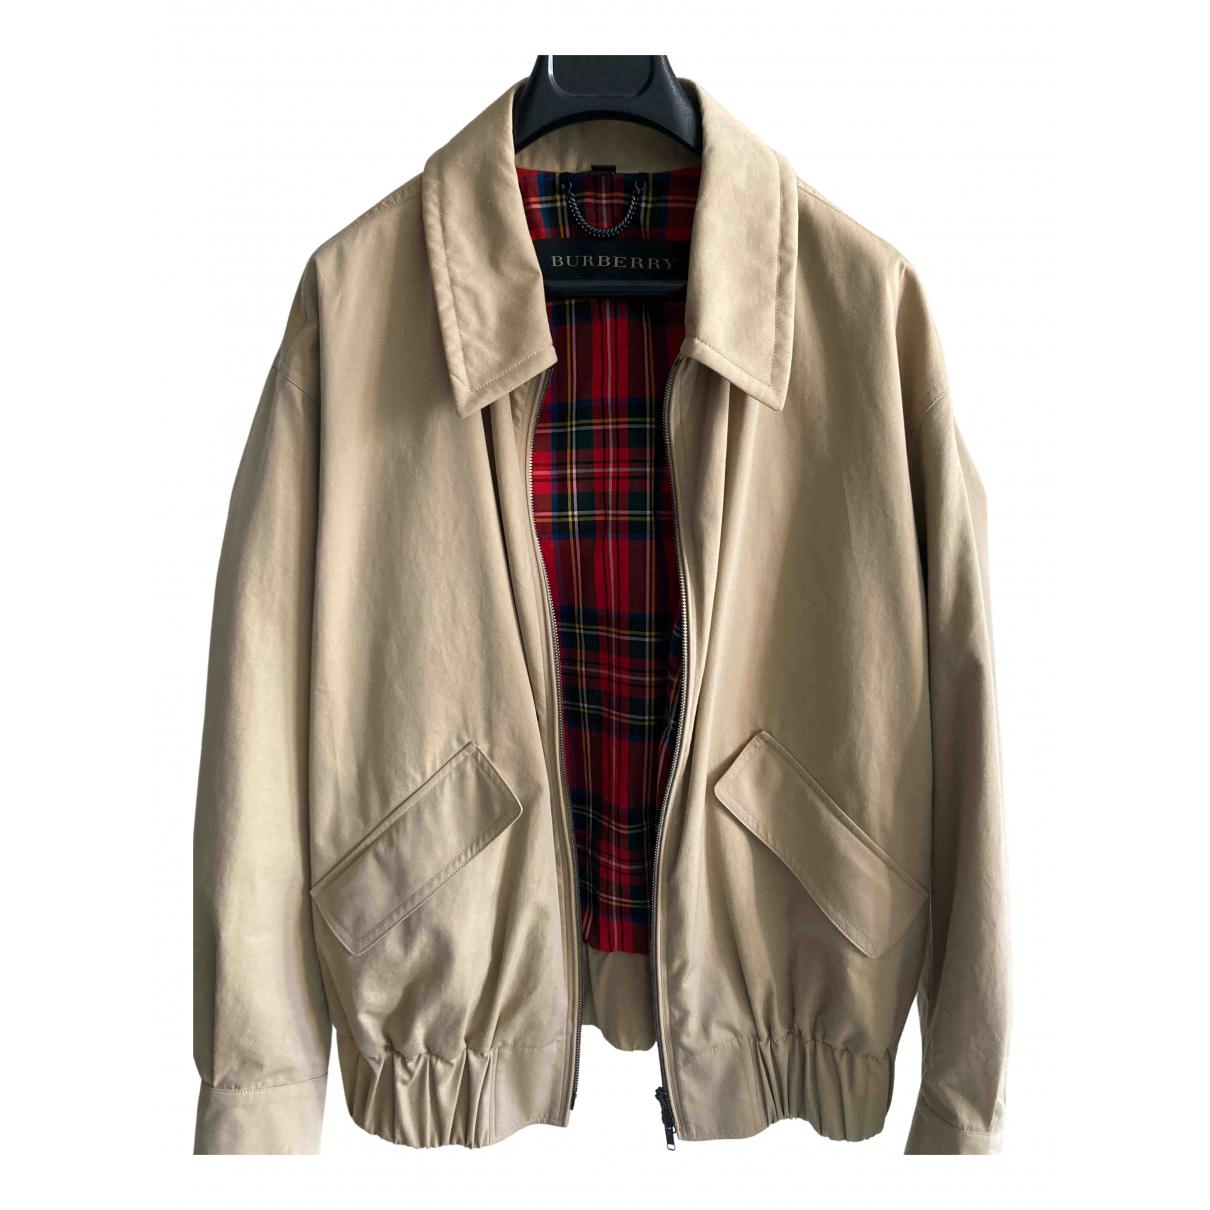 Burberry N Beige Cotton jacket  for Men 46 IT